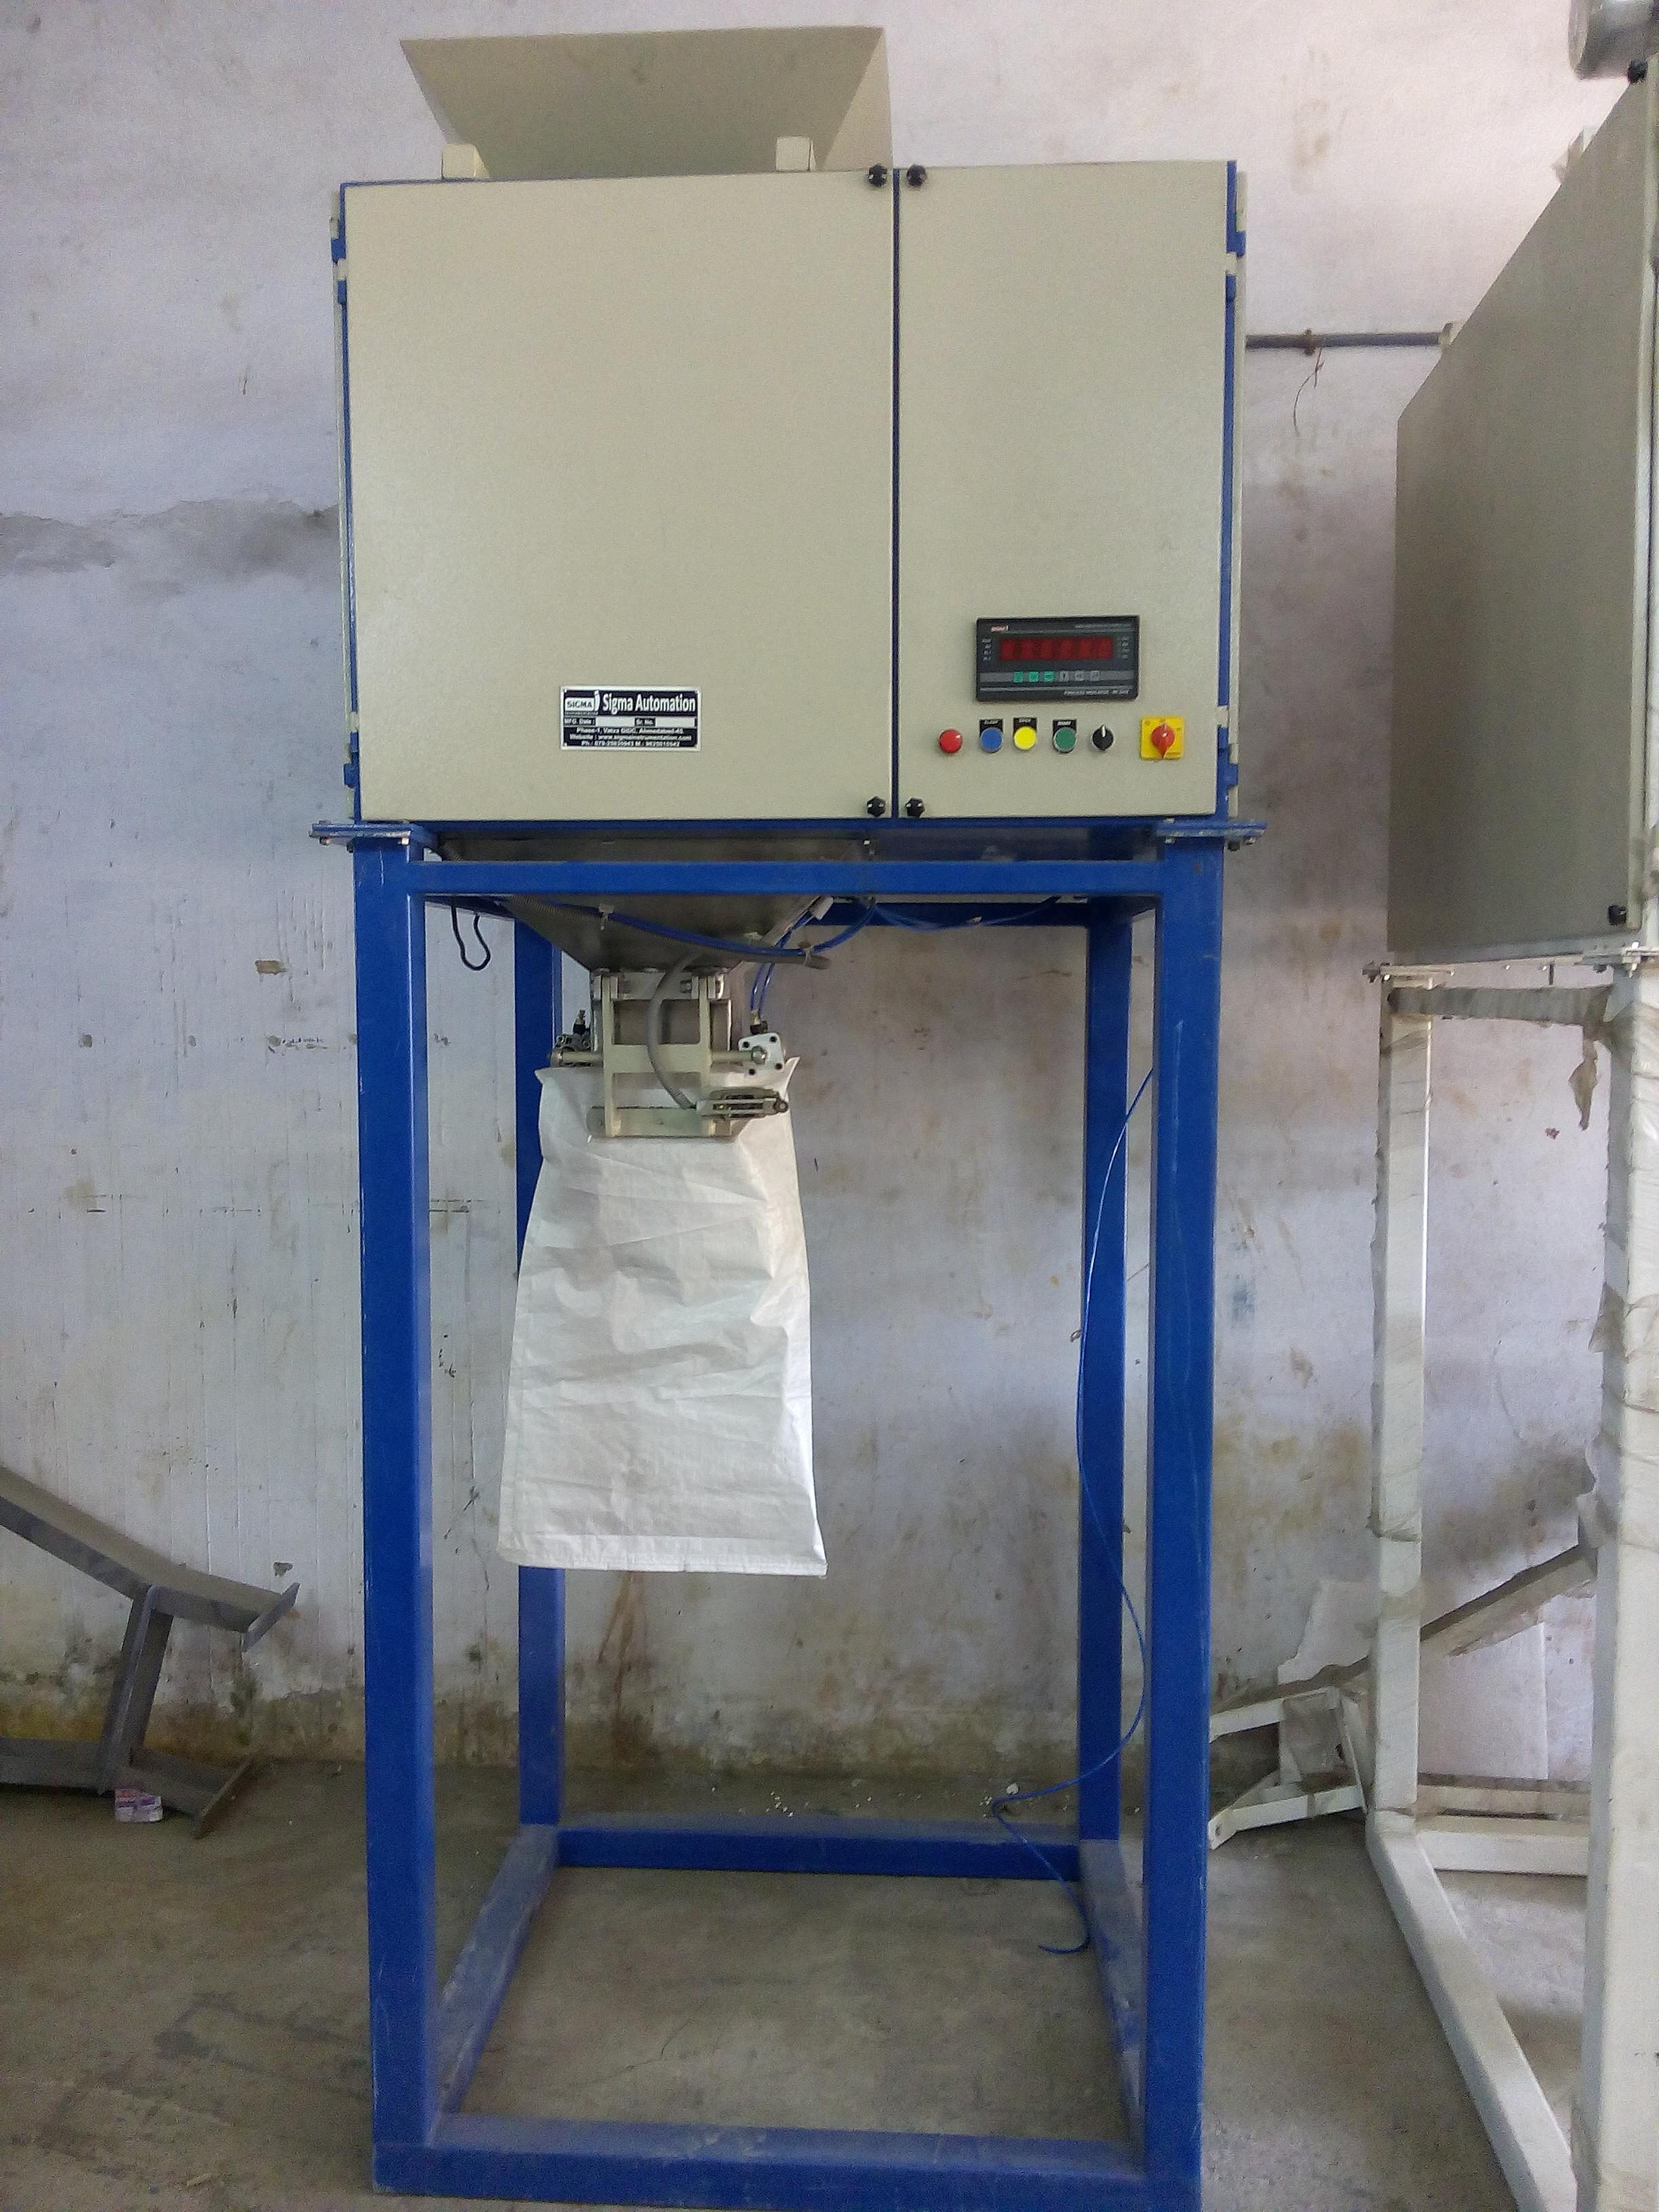 JBFM01 Bag Filling Machine